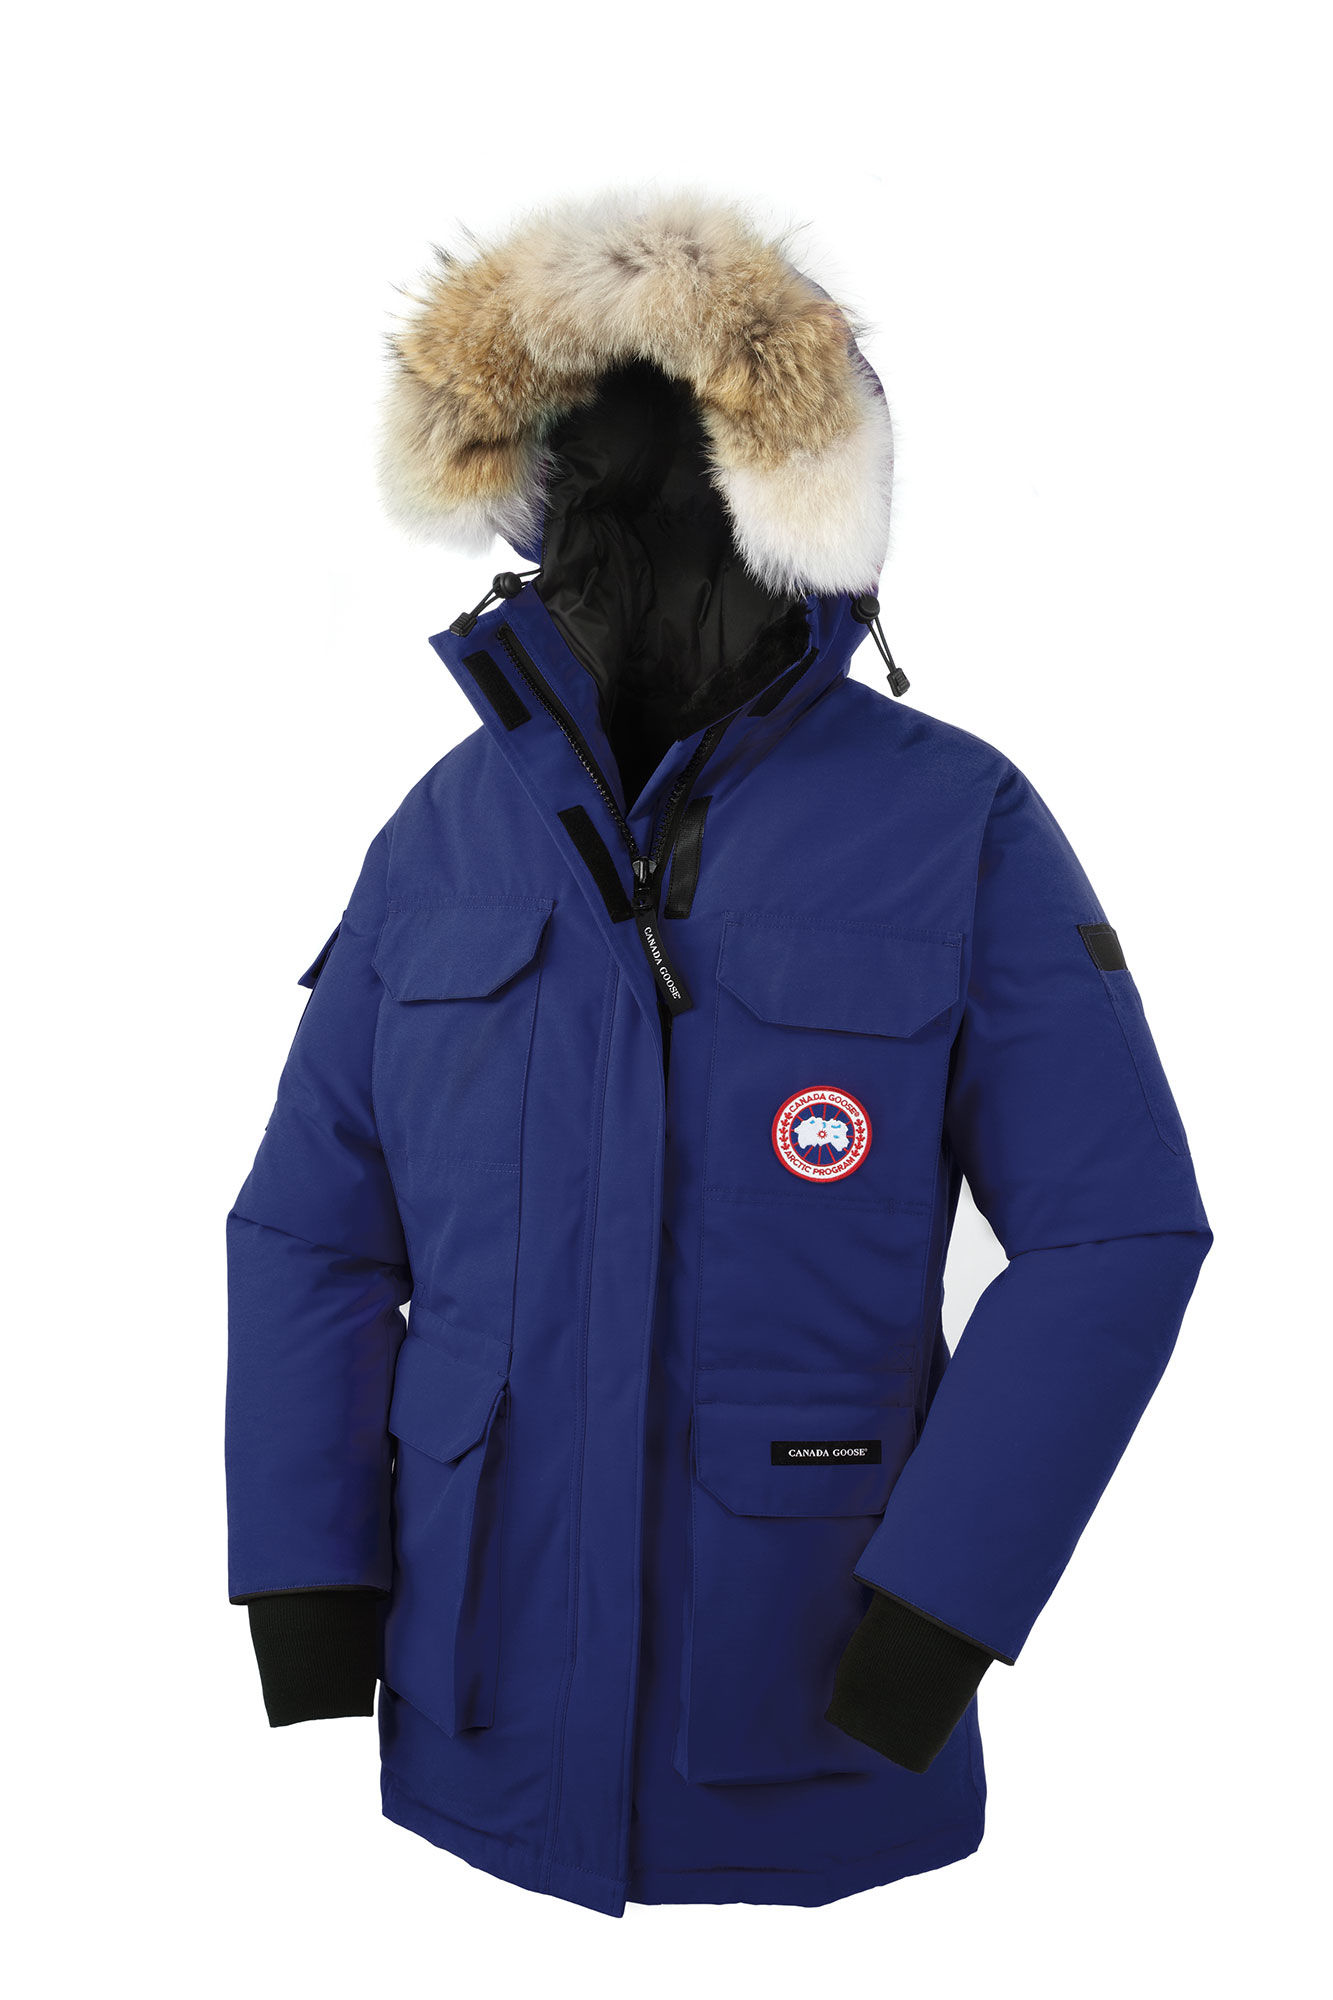 Canada Goose down outlet 2016 - Canada Goose Expedition | Shop Canada Goose Expedition Parkas on ...